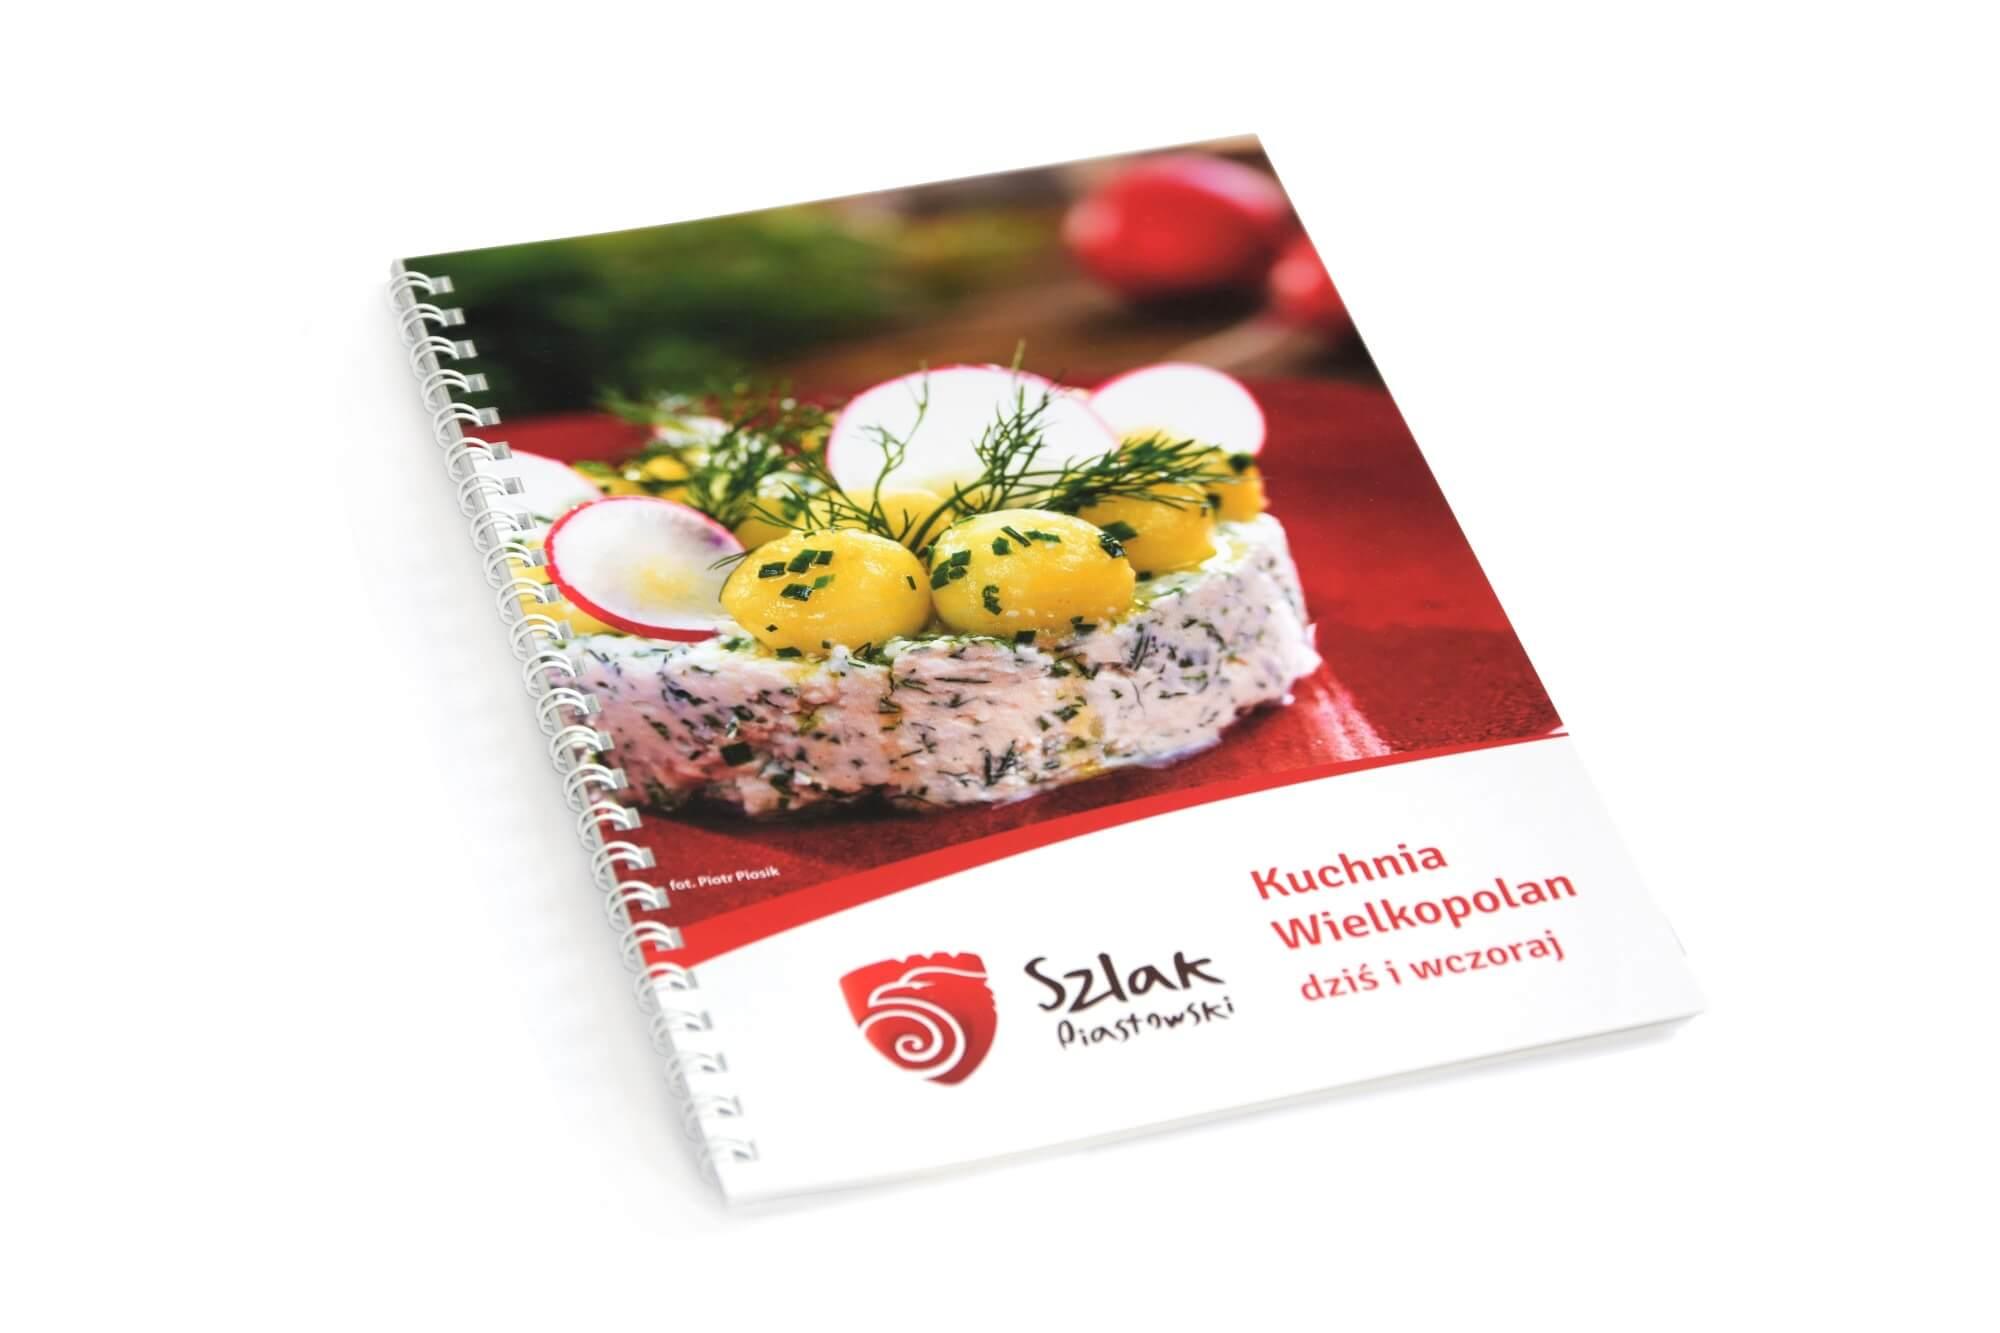 <br>Kuchnia Wielkopolan